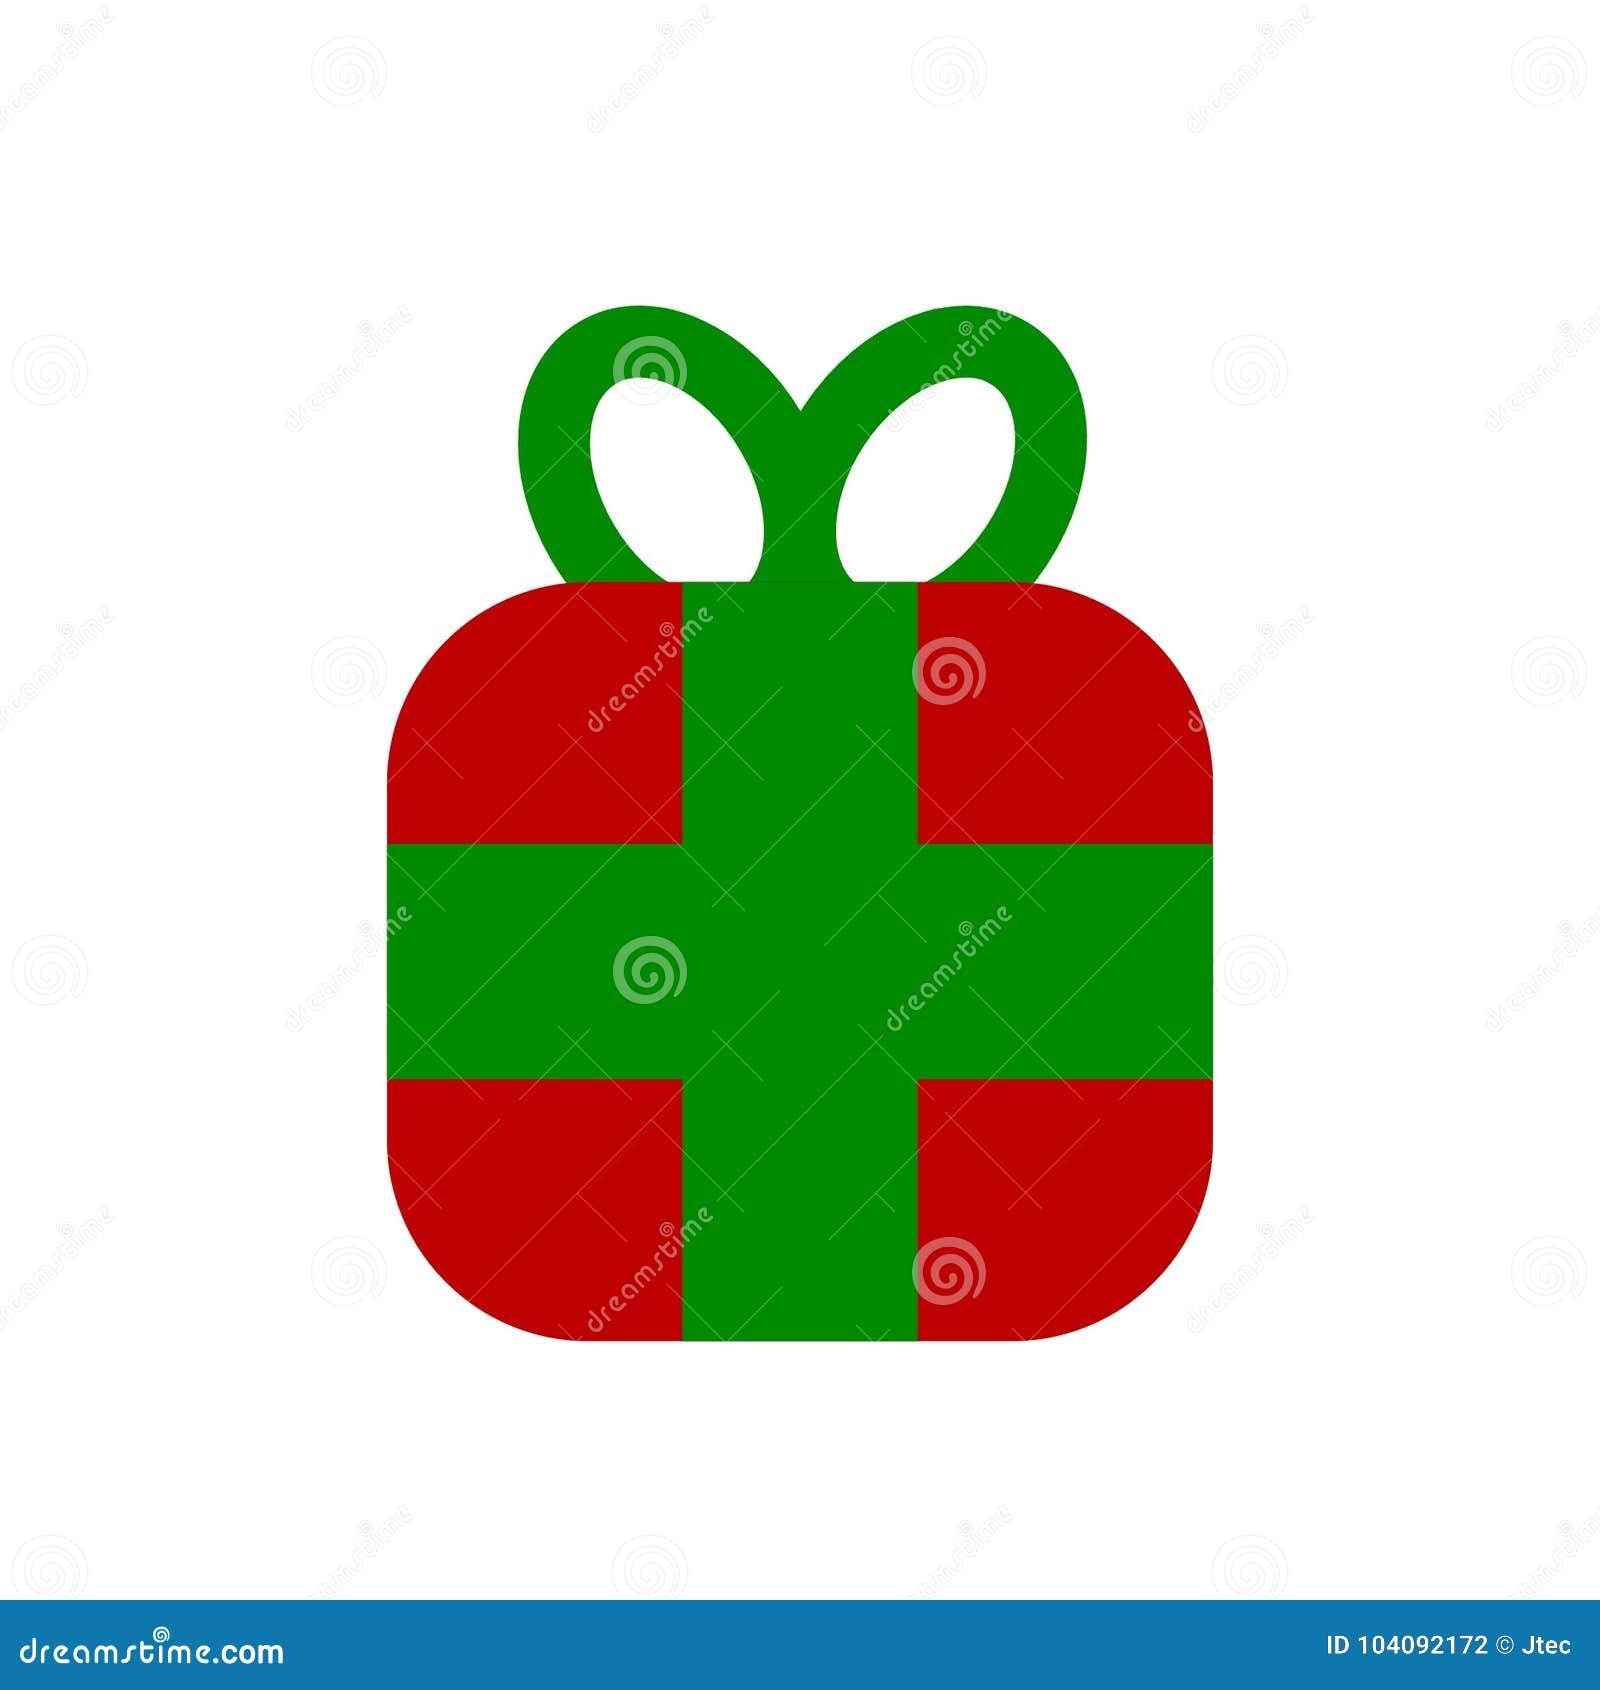 Gift stock illustration. Illustration of gift, illustration - 104092172